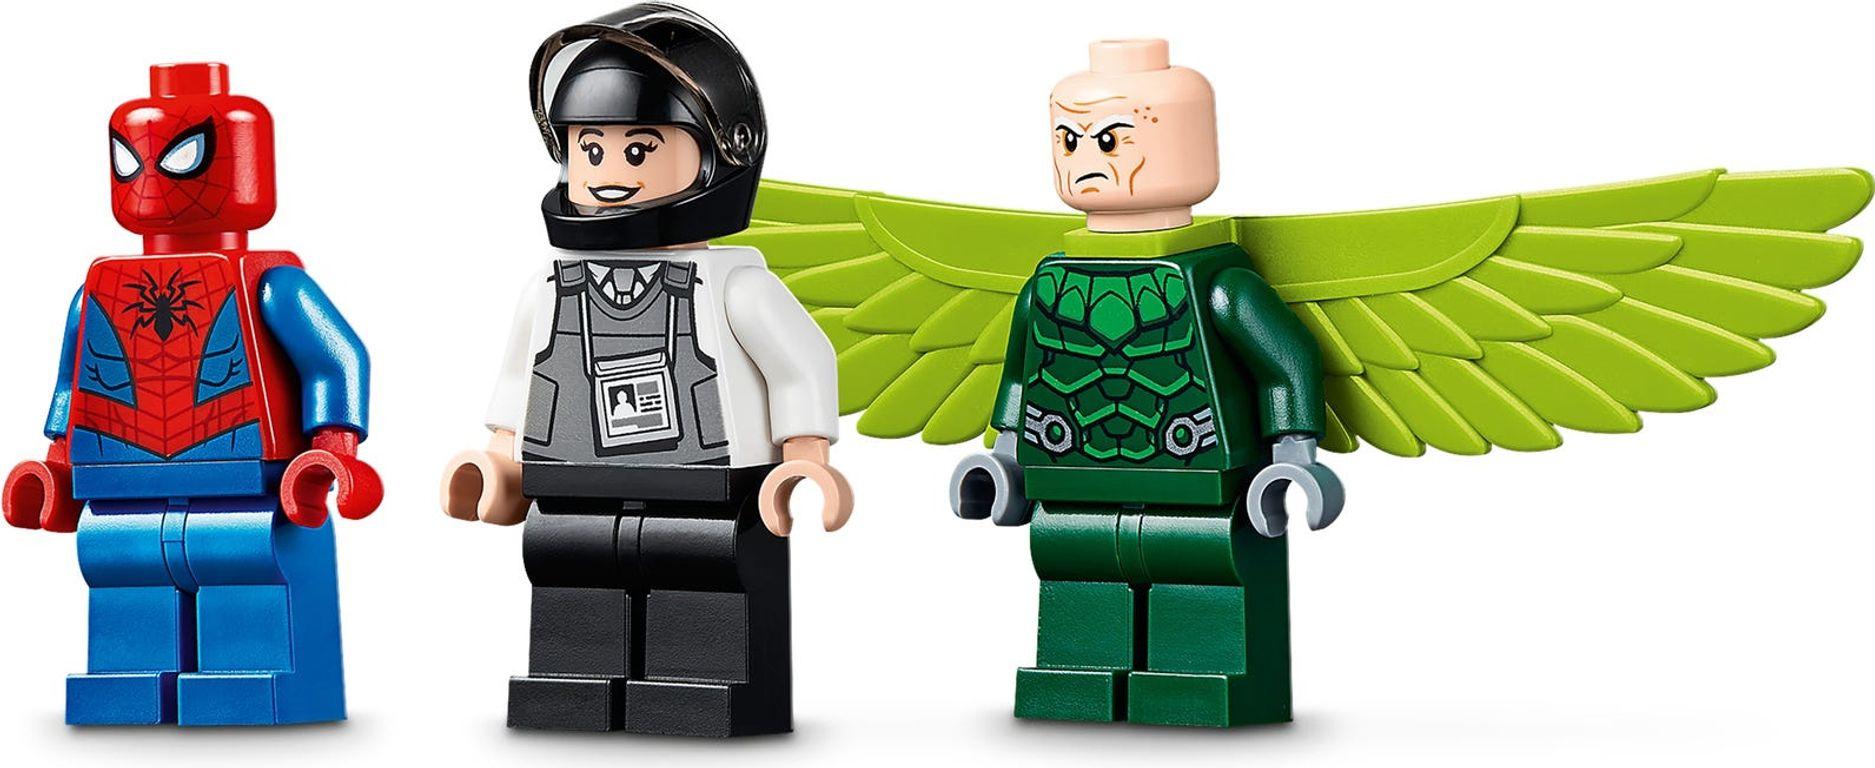 Vulture's Trucker Robbery minifigures